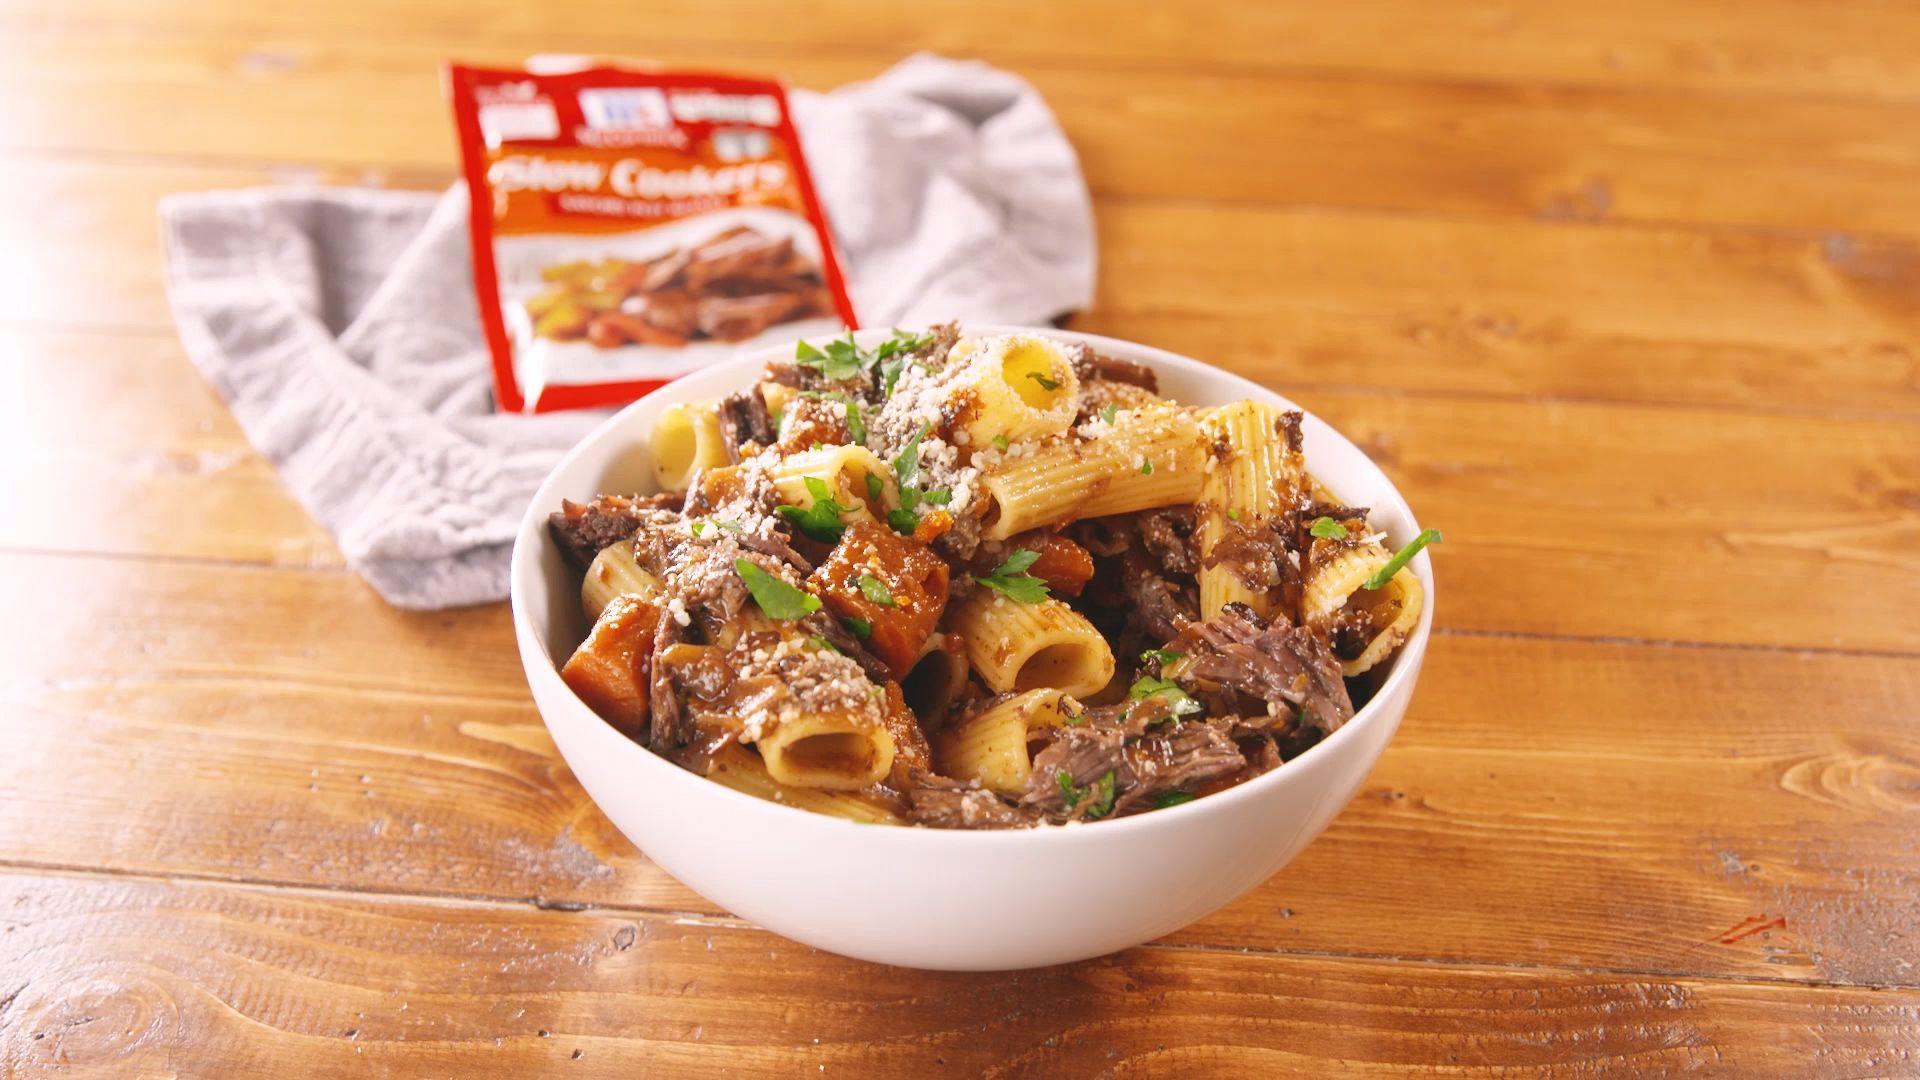 Best Pot Roast Pasta Recipe - How To